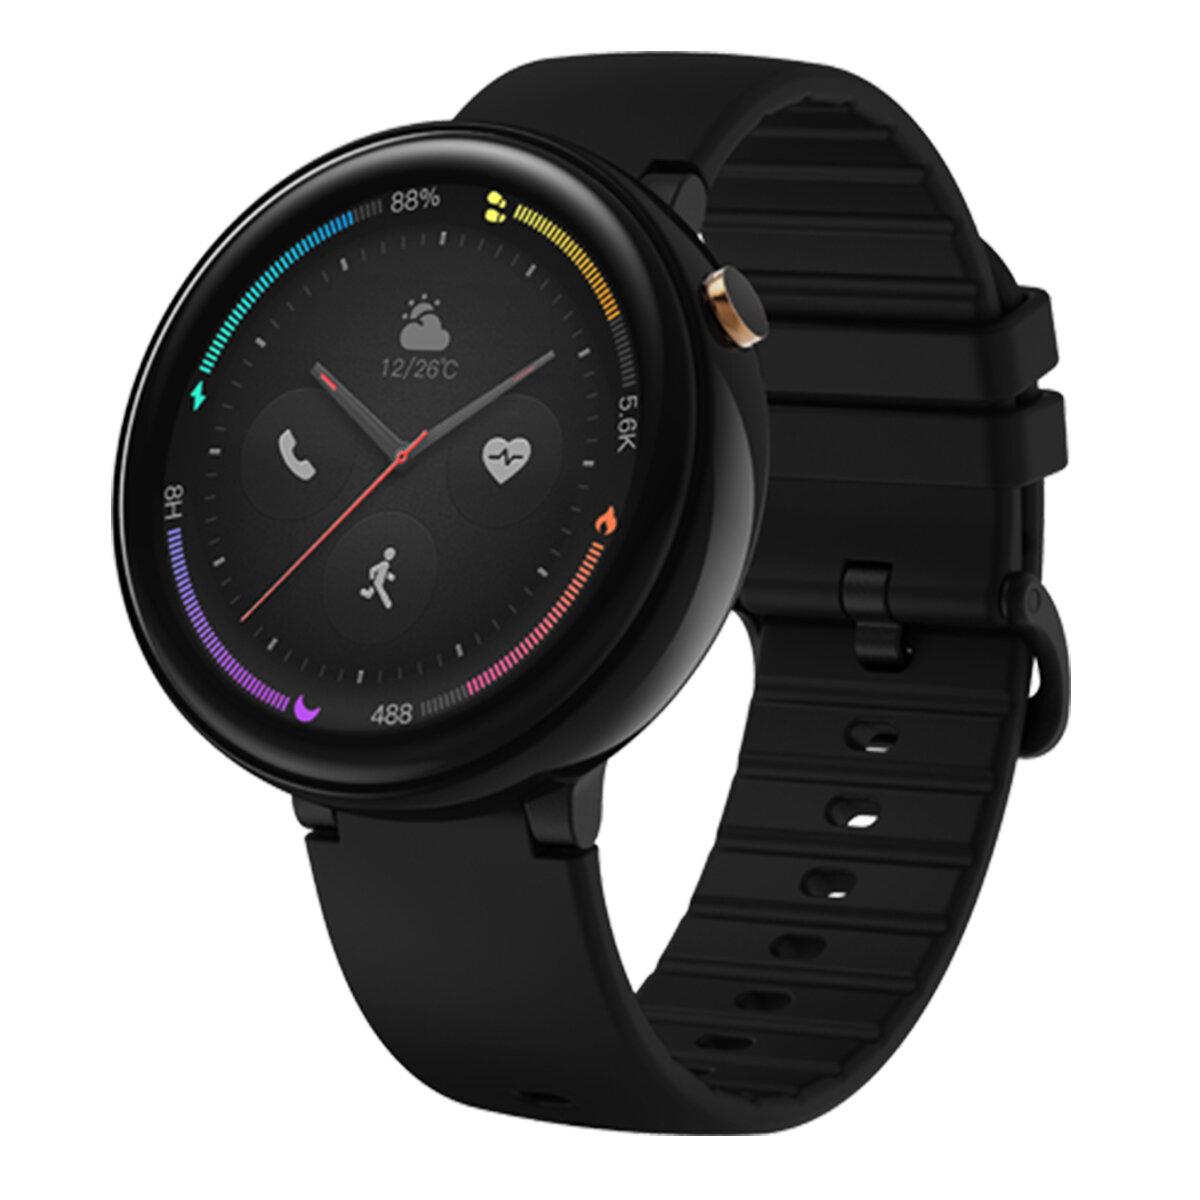 Original Amazfit Nexo Smart Watch Chinese Version Ceramic Bezel 2.5D AMOLED Retina Screen GPS 10 Sports Mode Smart Watch